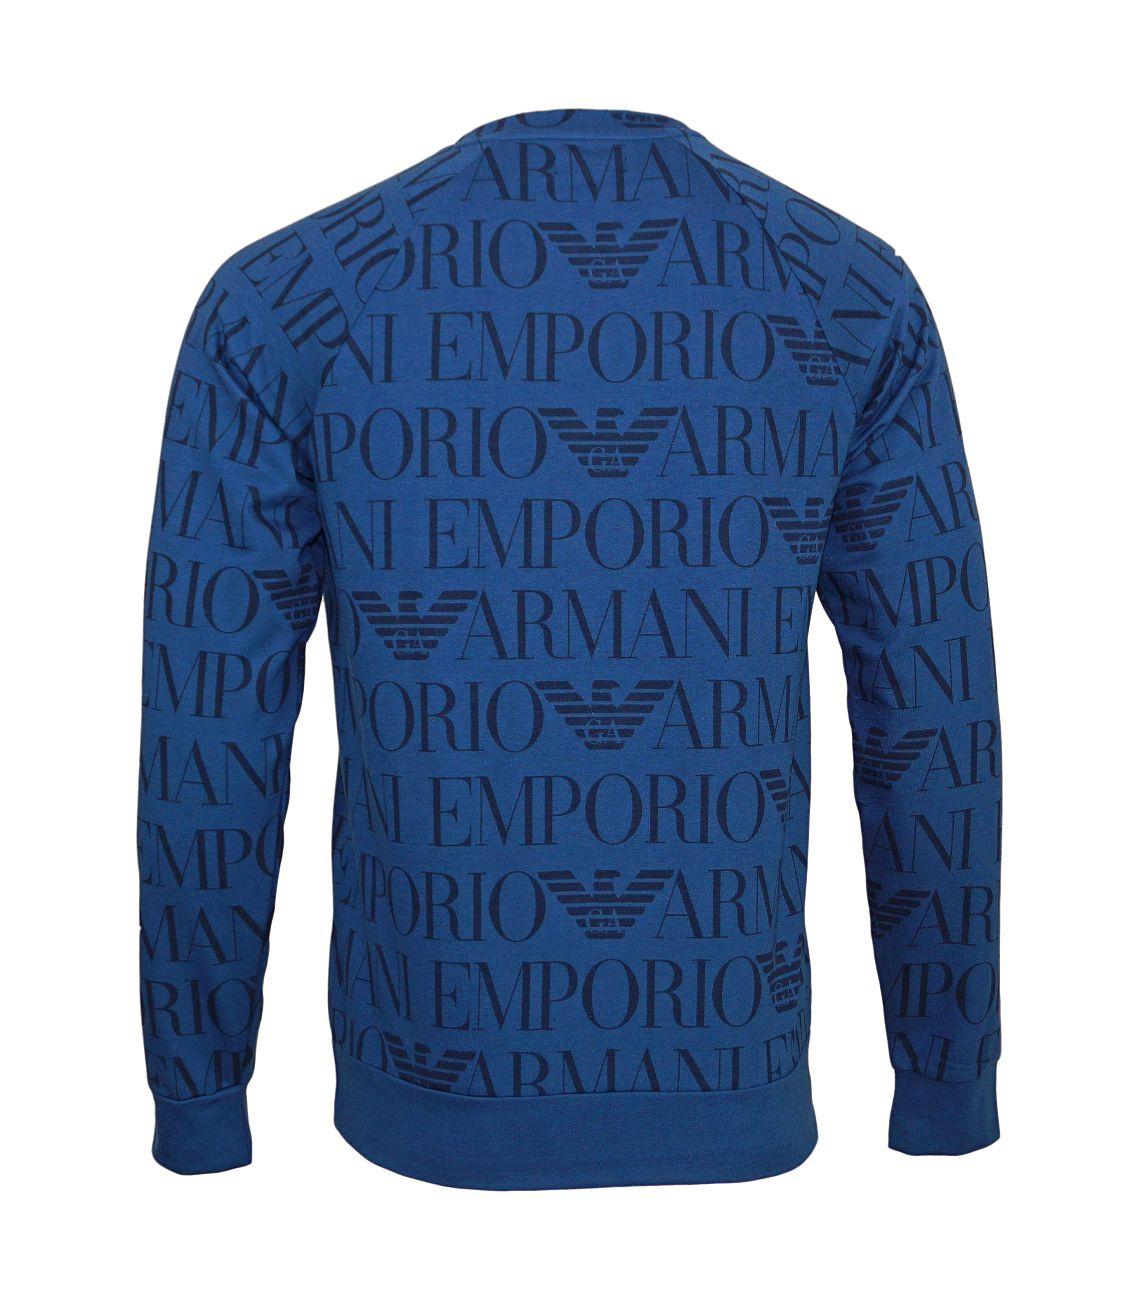 Emporio Armani Sweater Rundhals Pullover 111062 8P566 13634 F18-EAS1